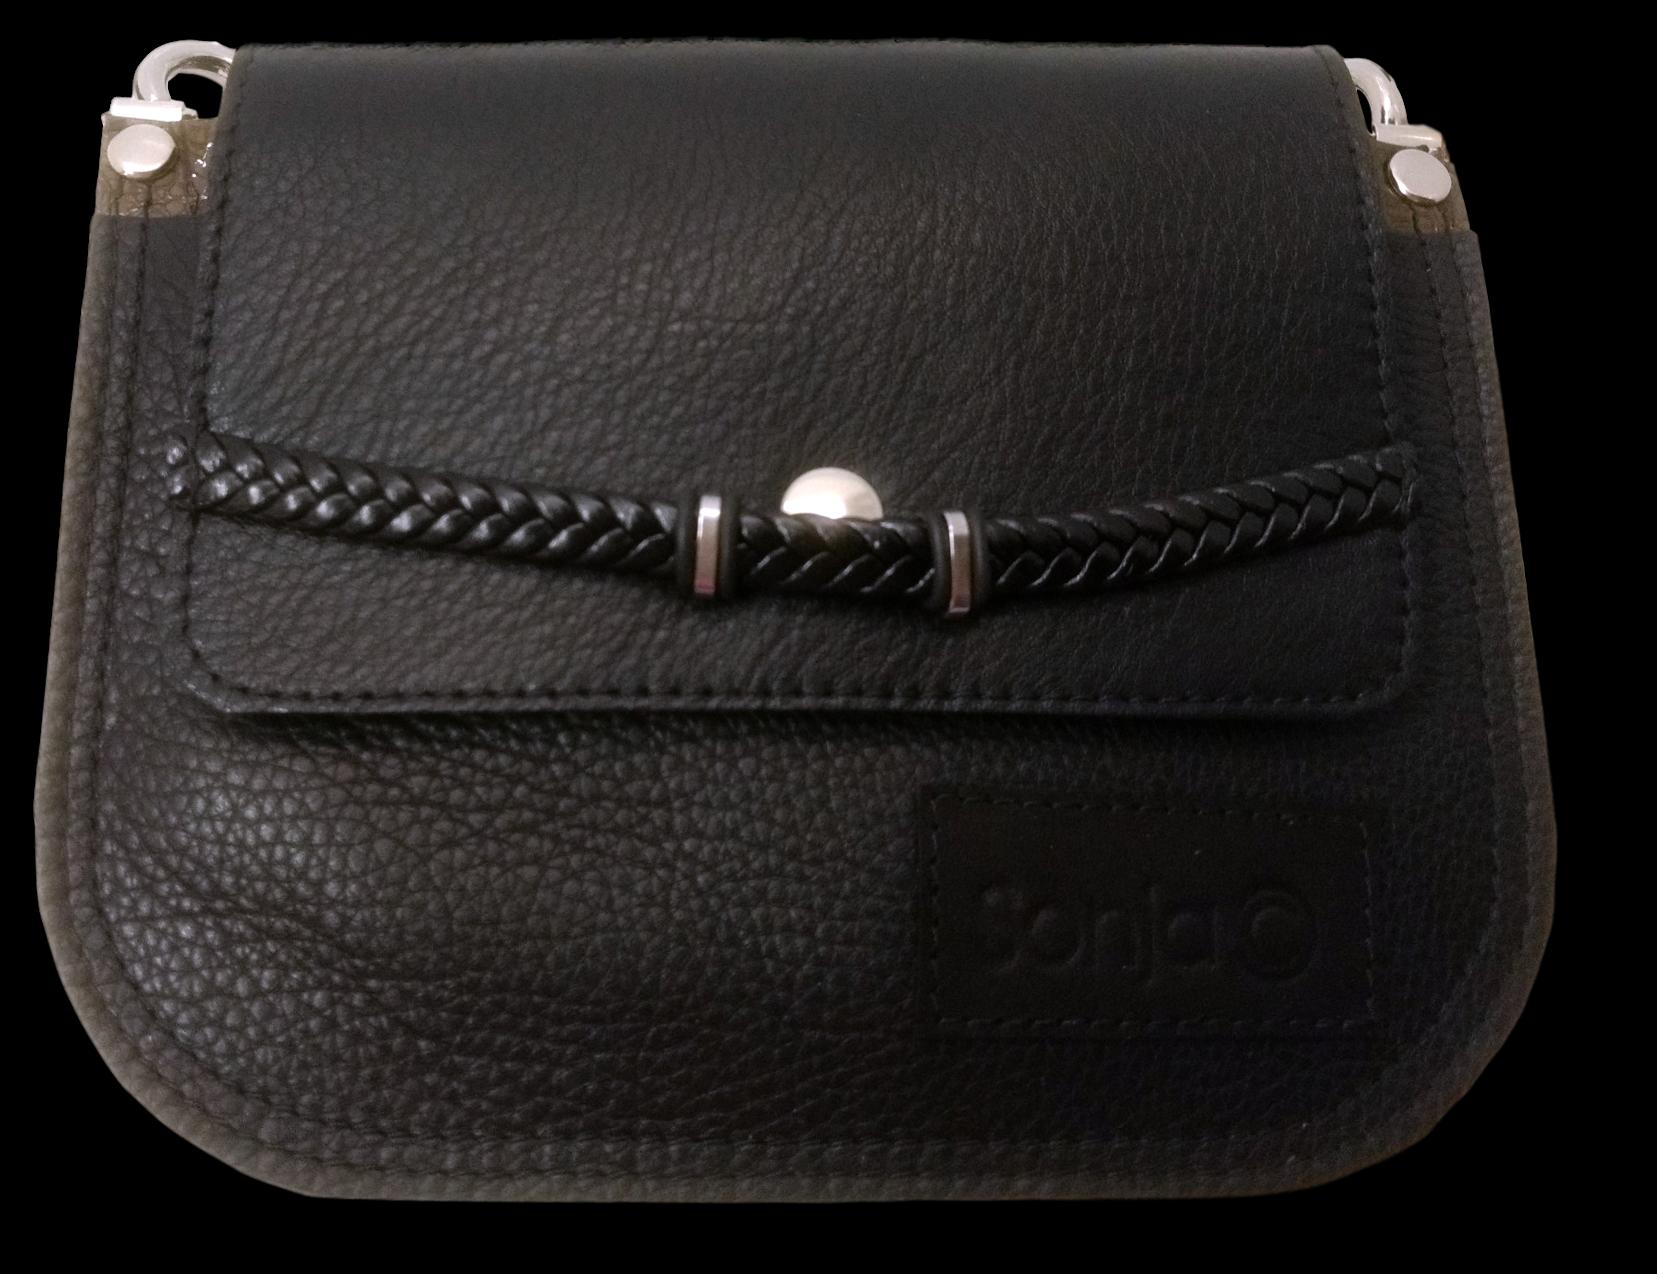 Black with Braid Leather Pocket Bag